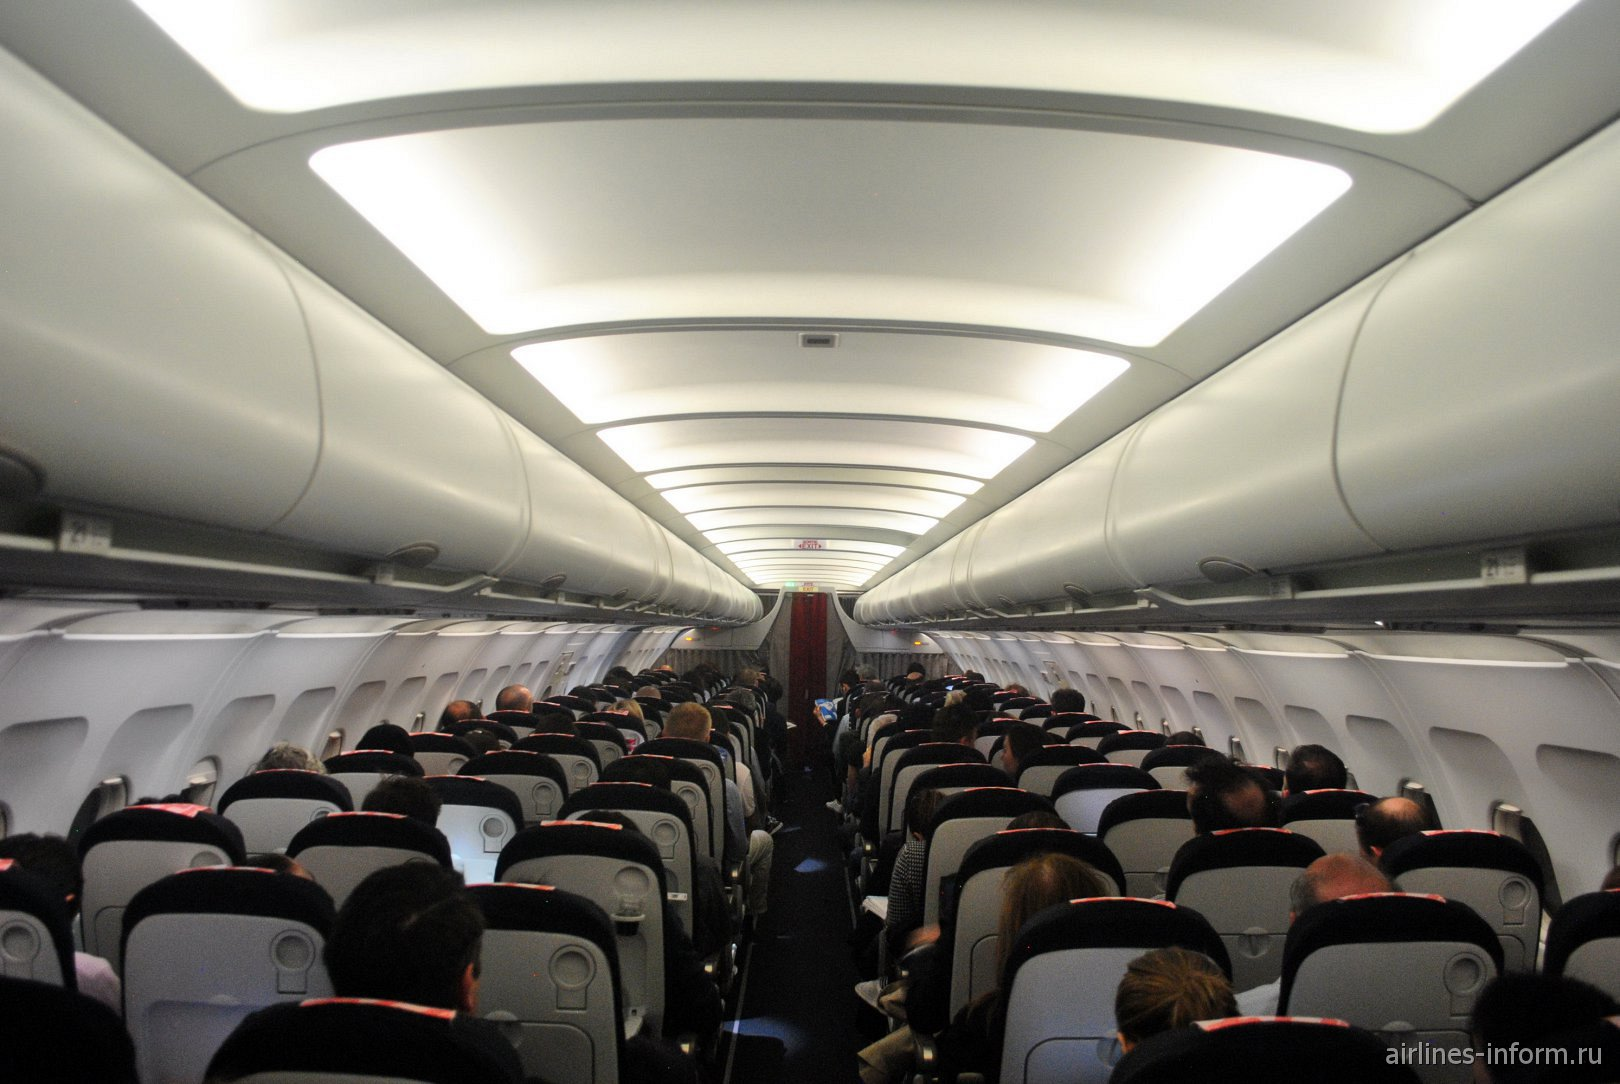 Пассажирский салона самолета Airbus A318 авиакомпании Air France